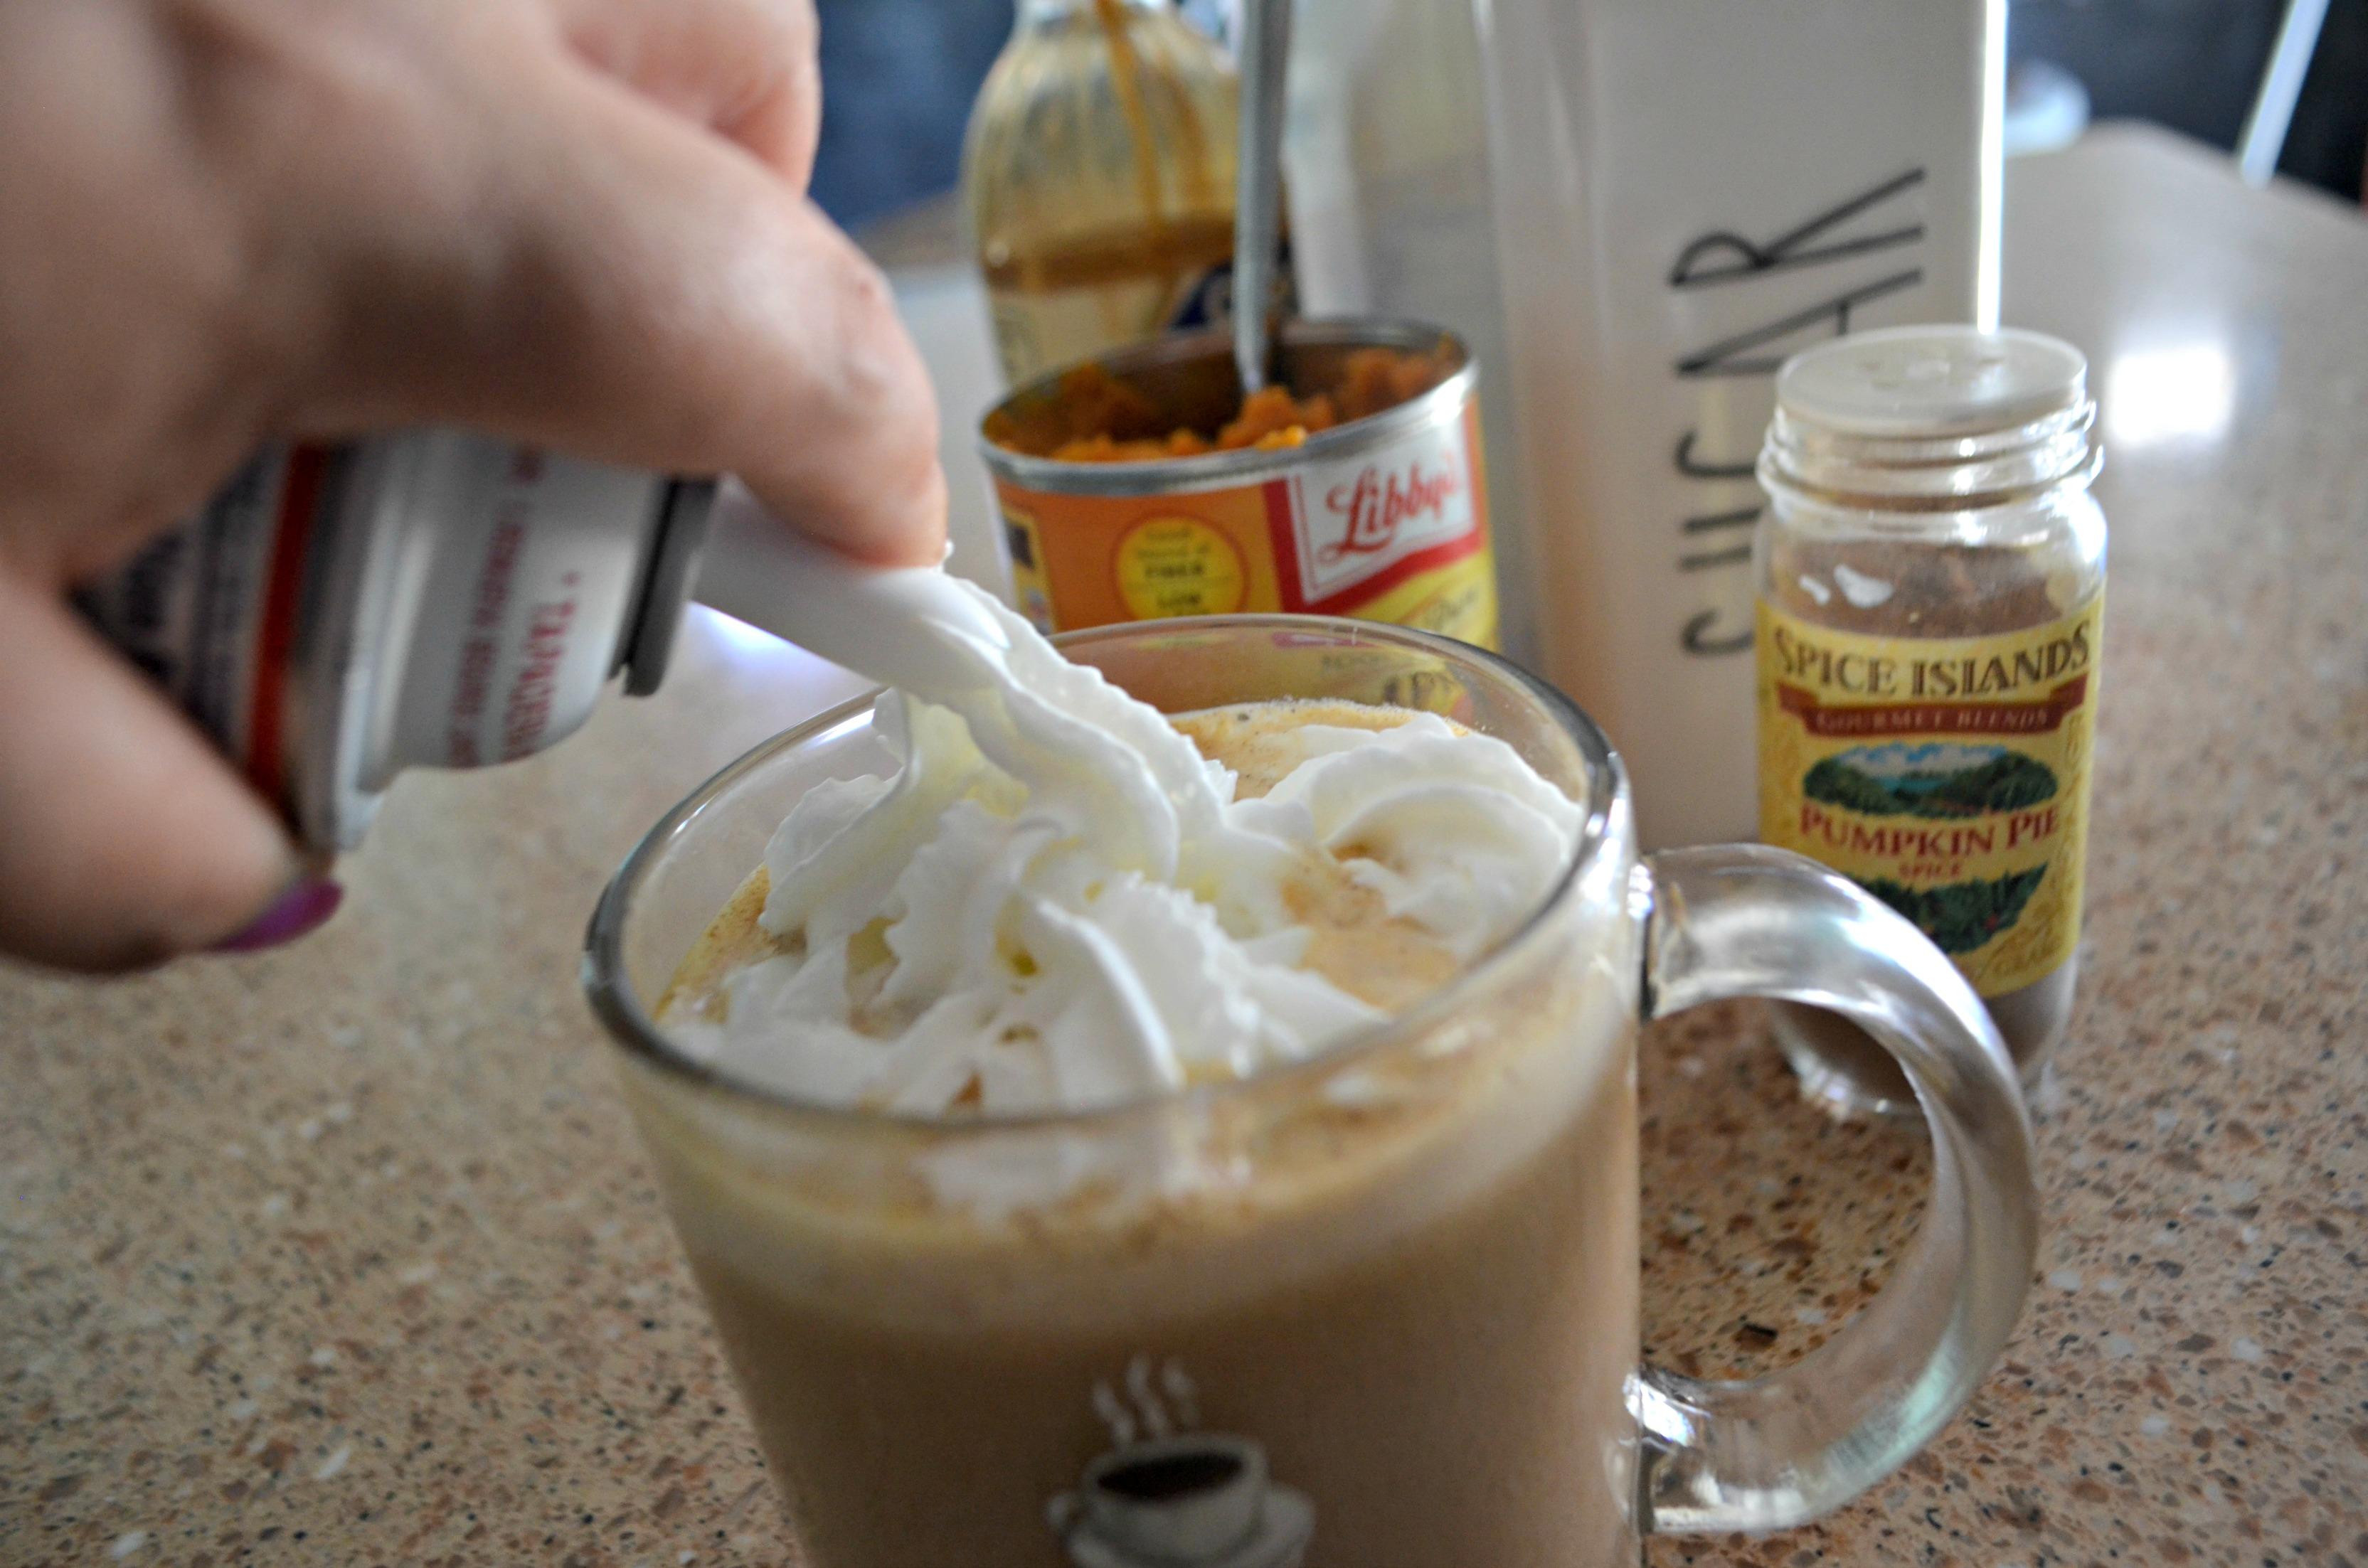 DIY Pumpkin Spice Latte - adding whipped cream on top